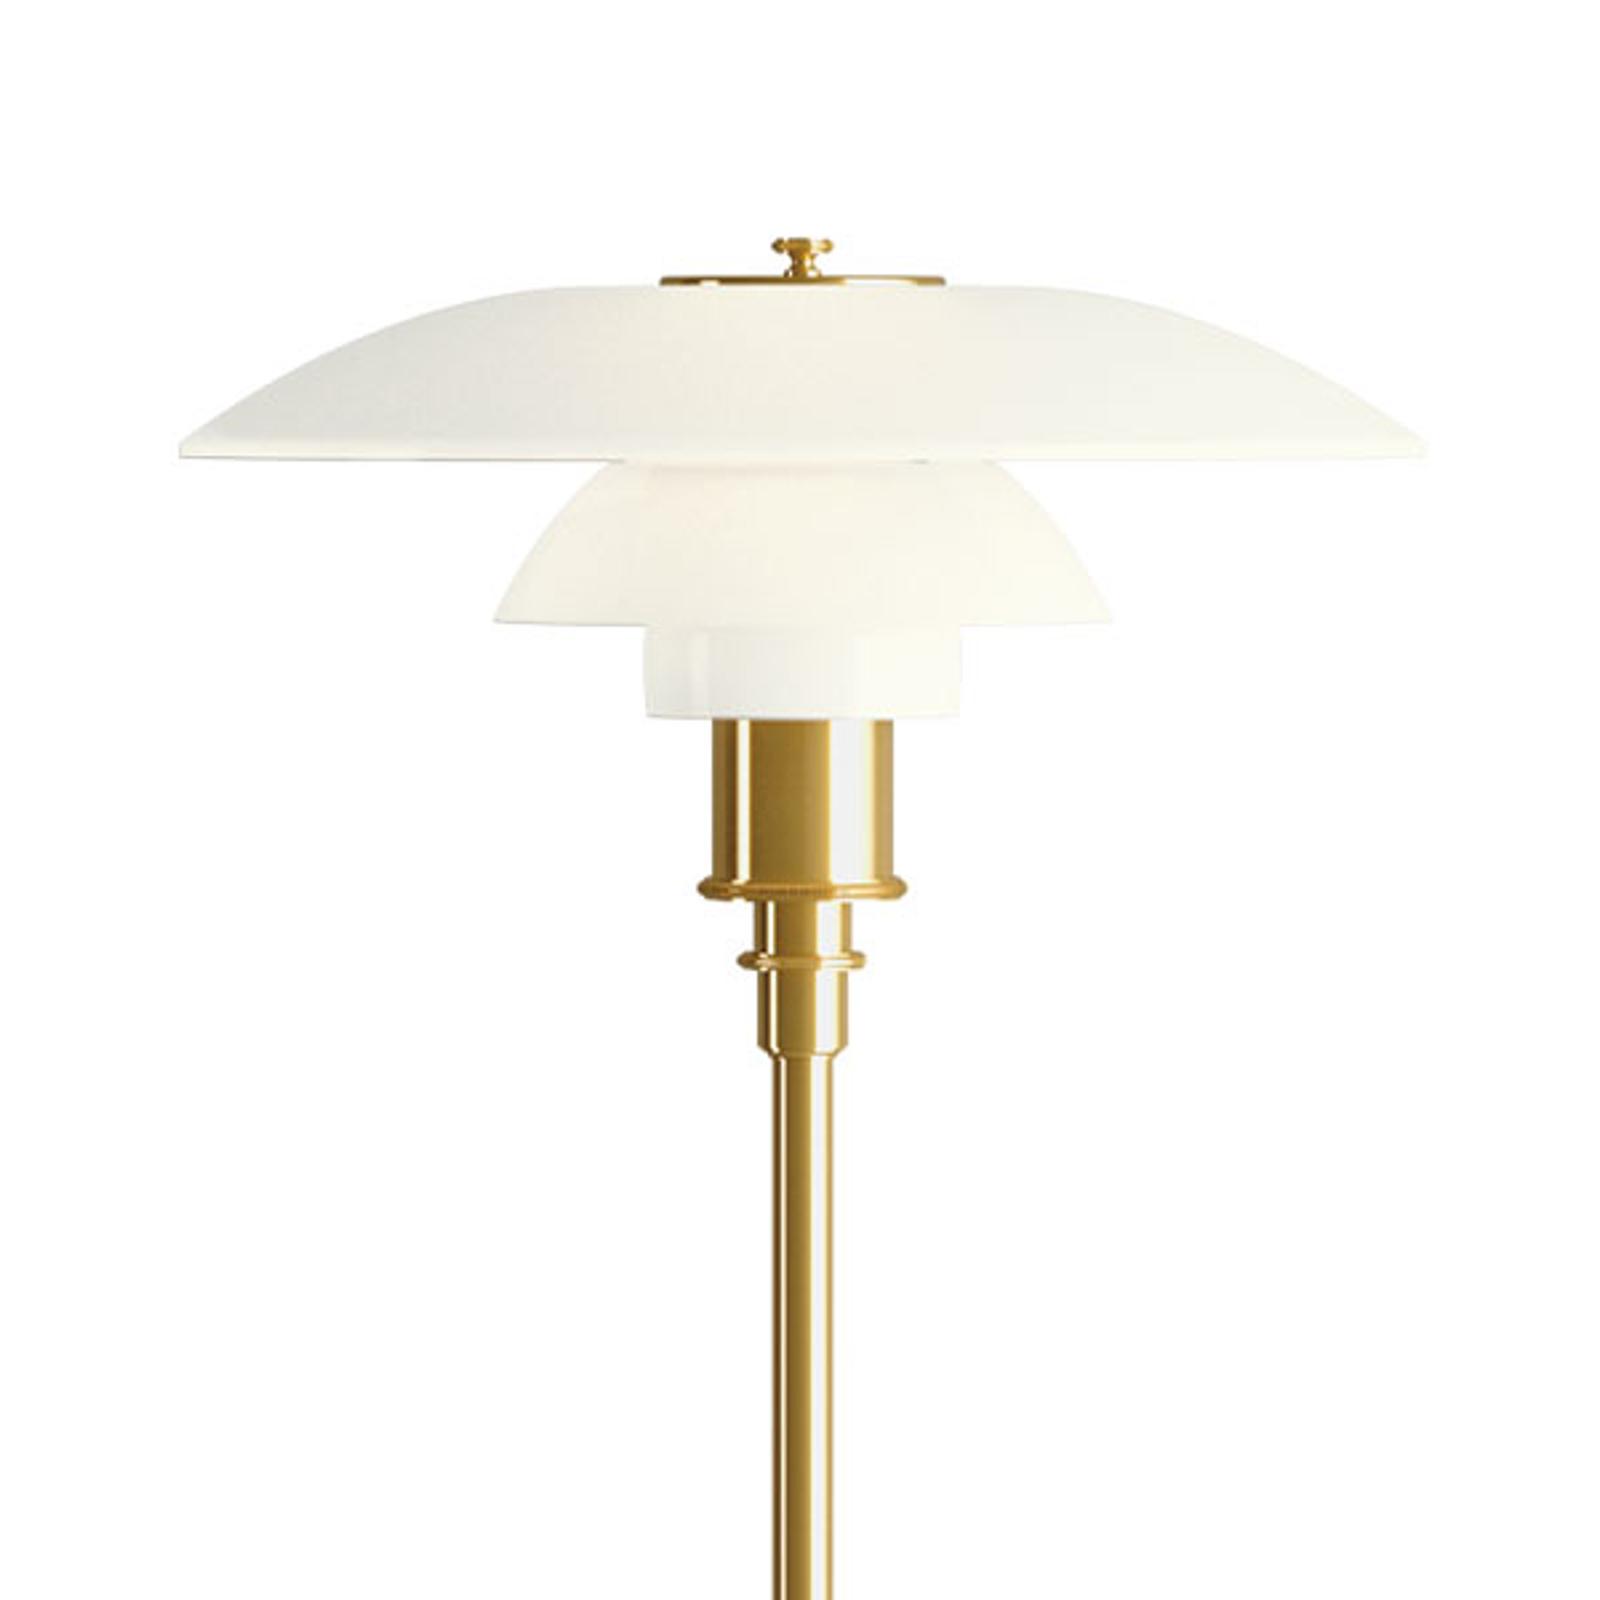 Louis Poulsen PH 3 1/2-2 1/2 Stehlampe messing